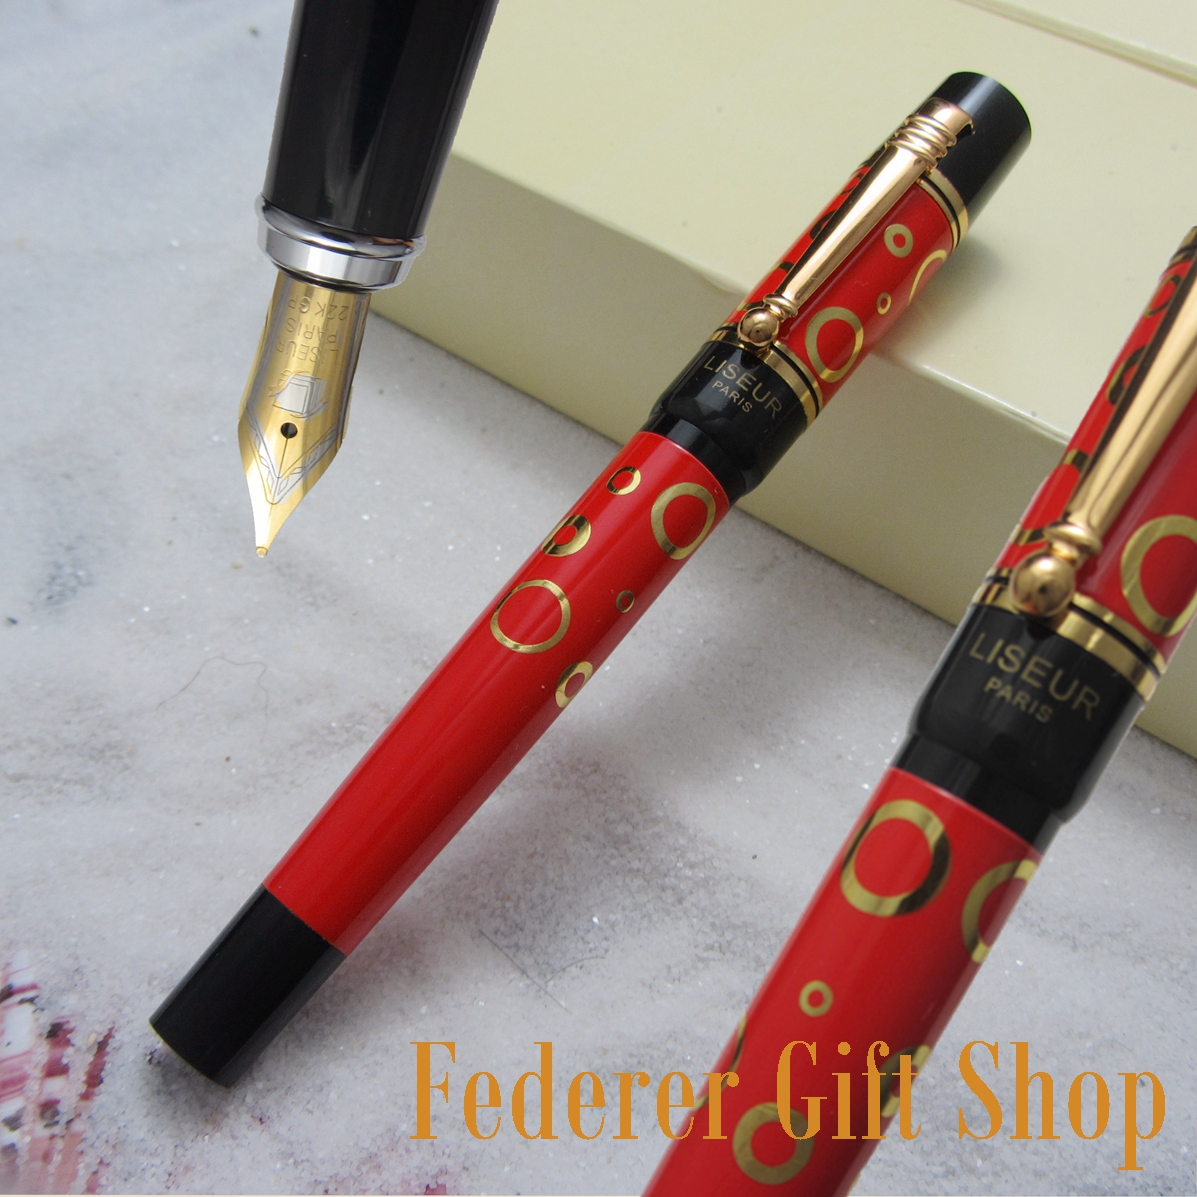 LISEUR L601 fashion Gold Circle pattern Fountain pen F nib Business gift ink pen and Original box<br>